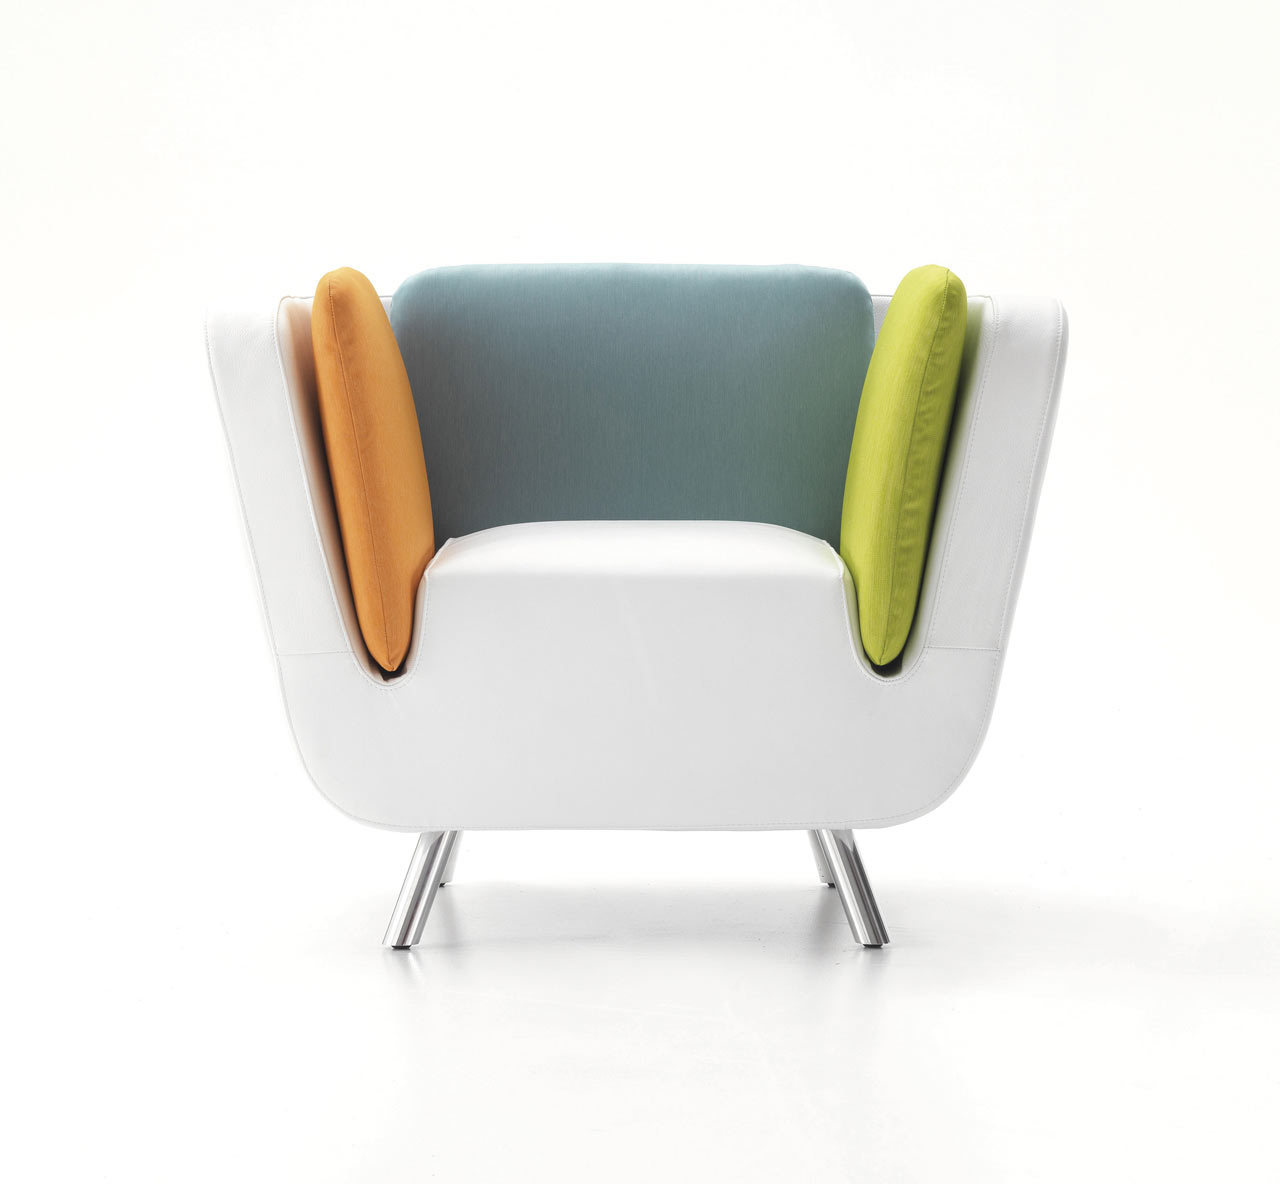 143047854491 – nook armchair by karim rashid